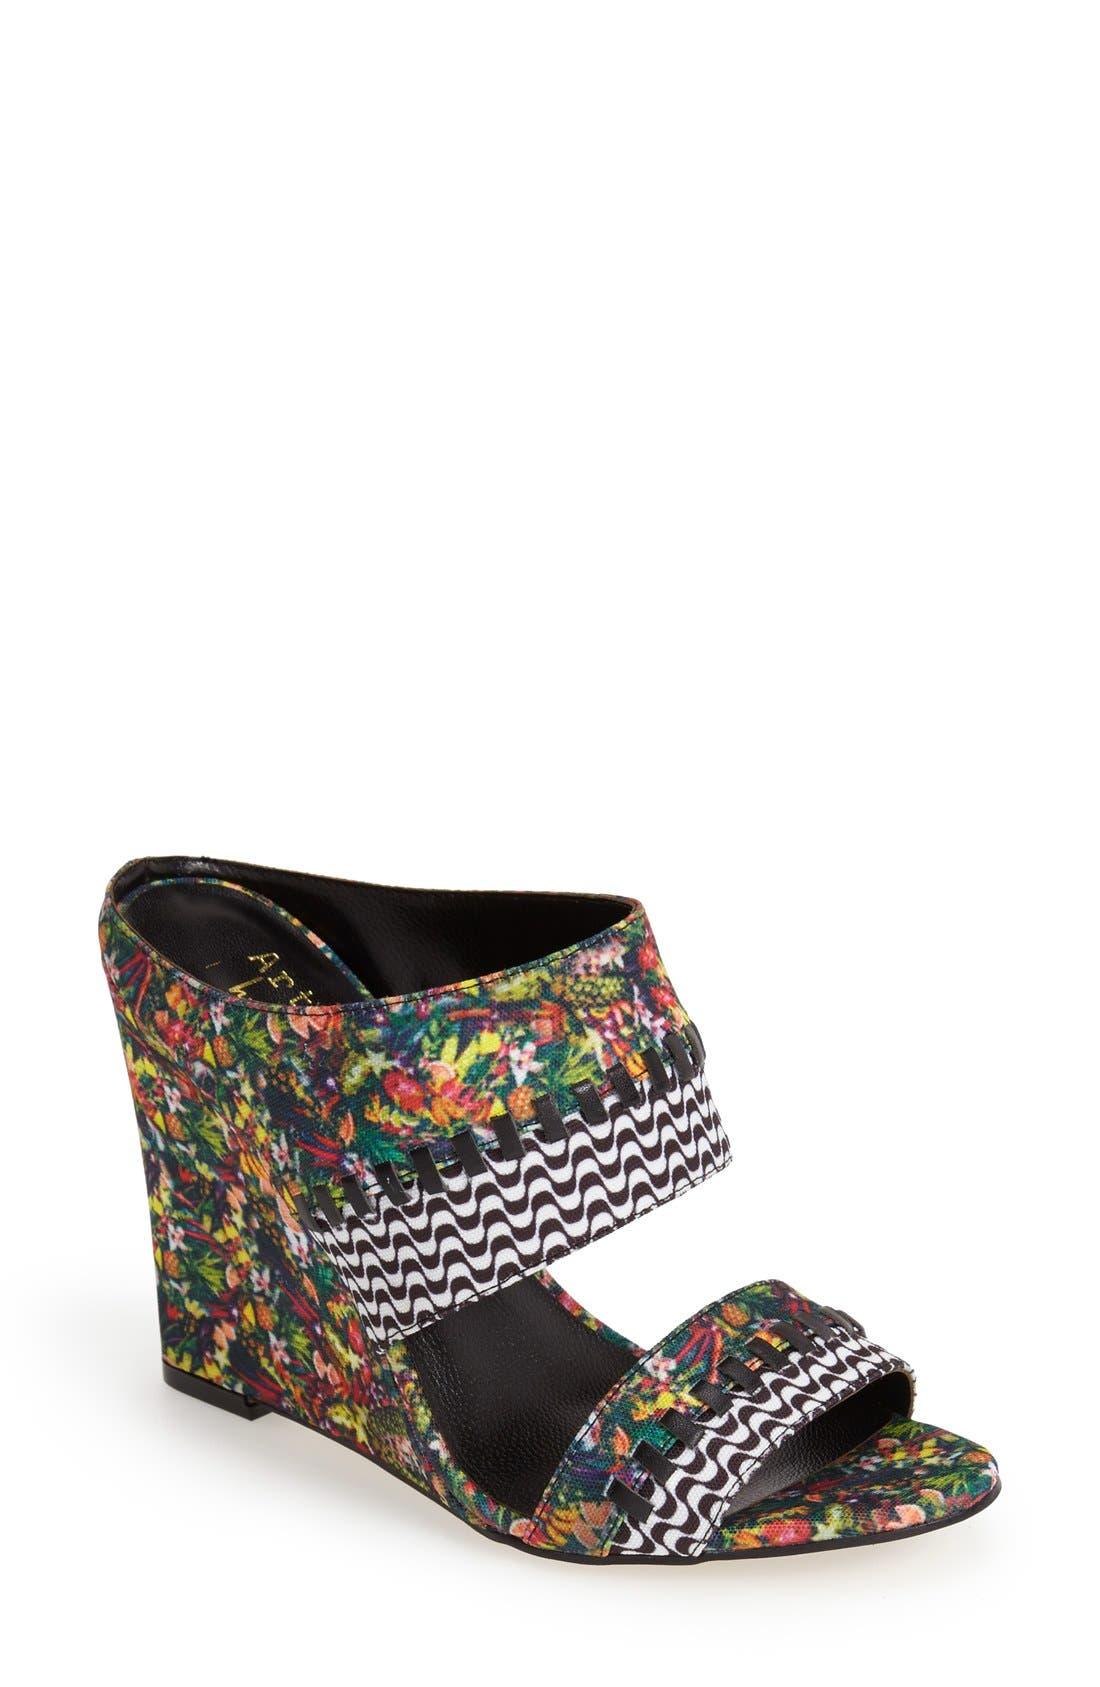 Alternate Image 1 Selected - Nicole Miller 'Orlando' Wedge Sandal (Women)